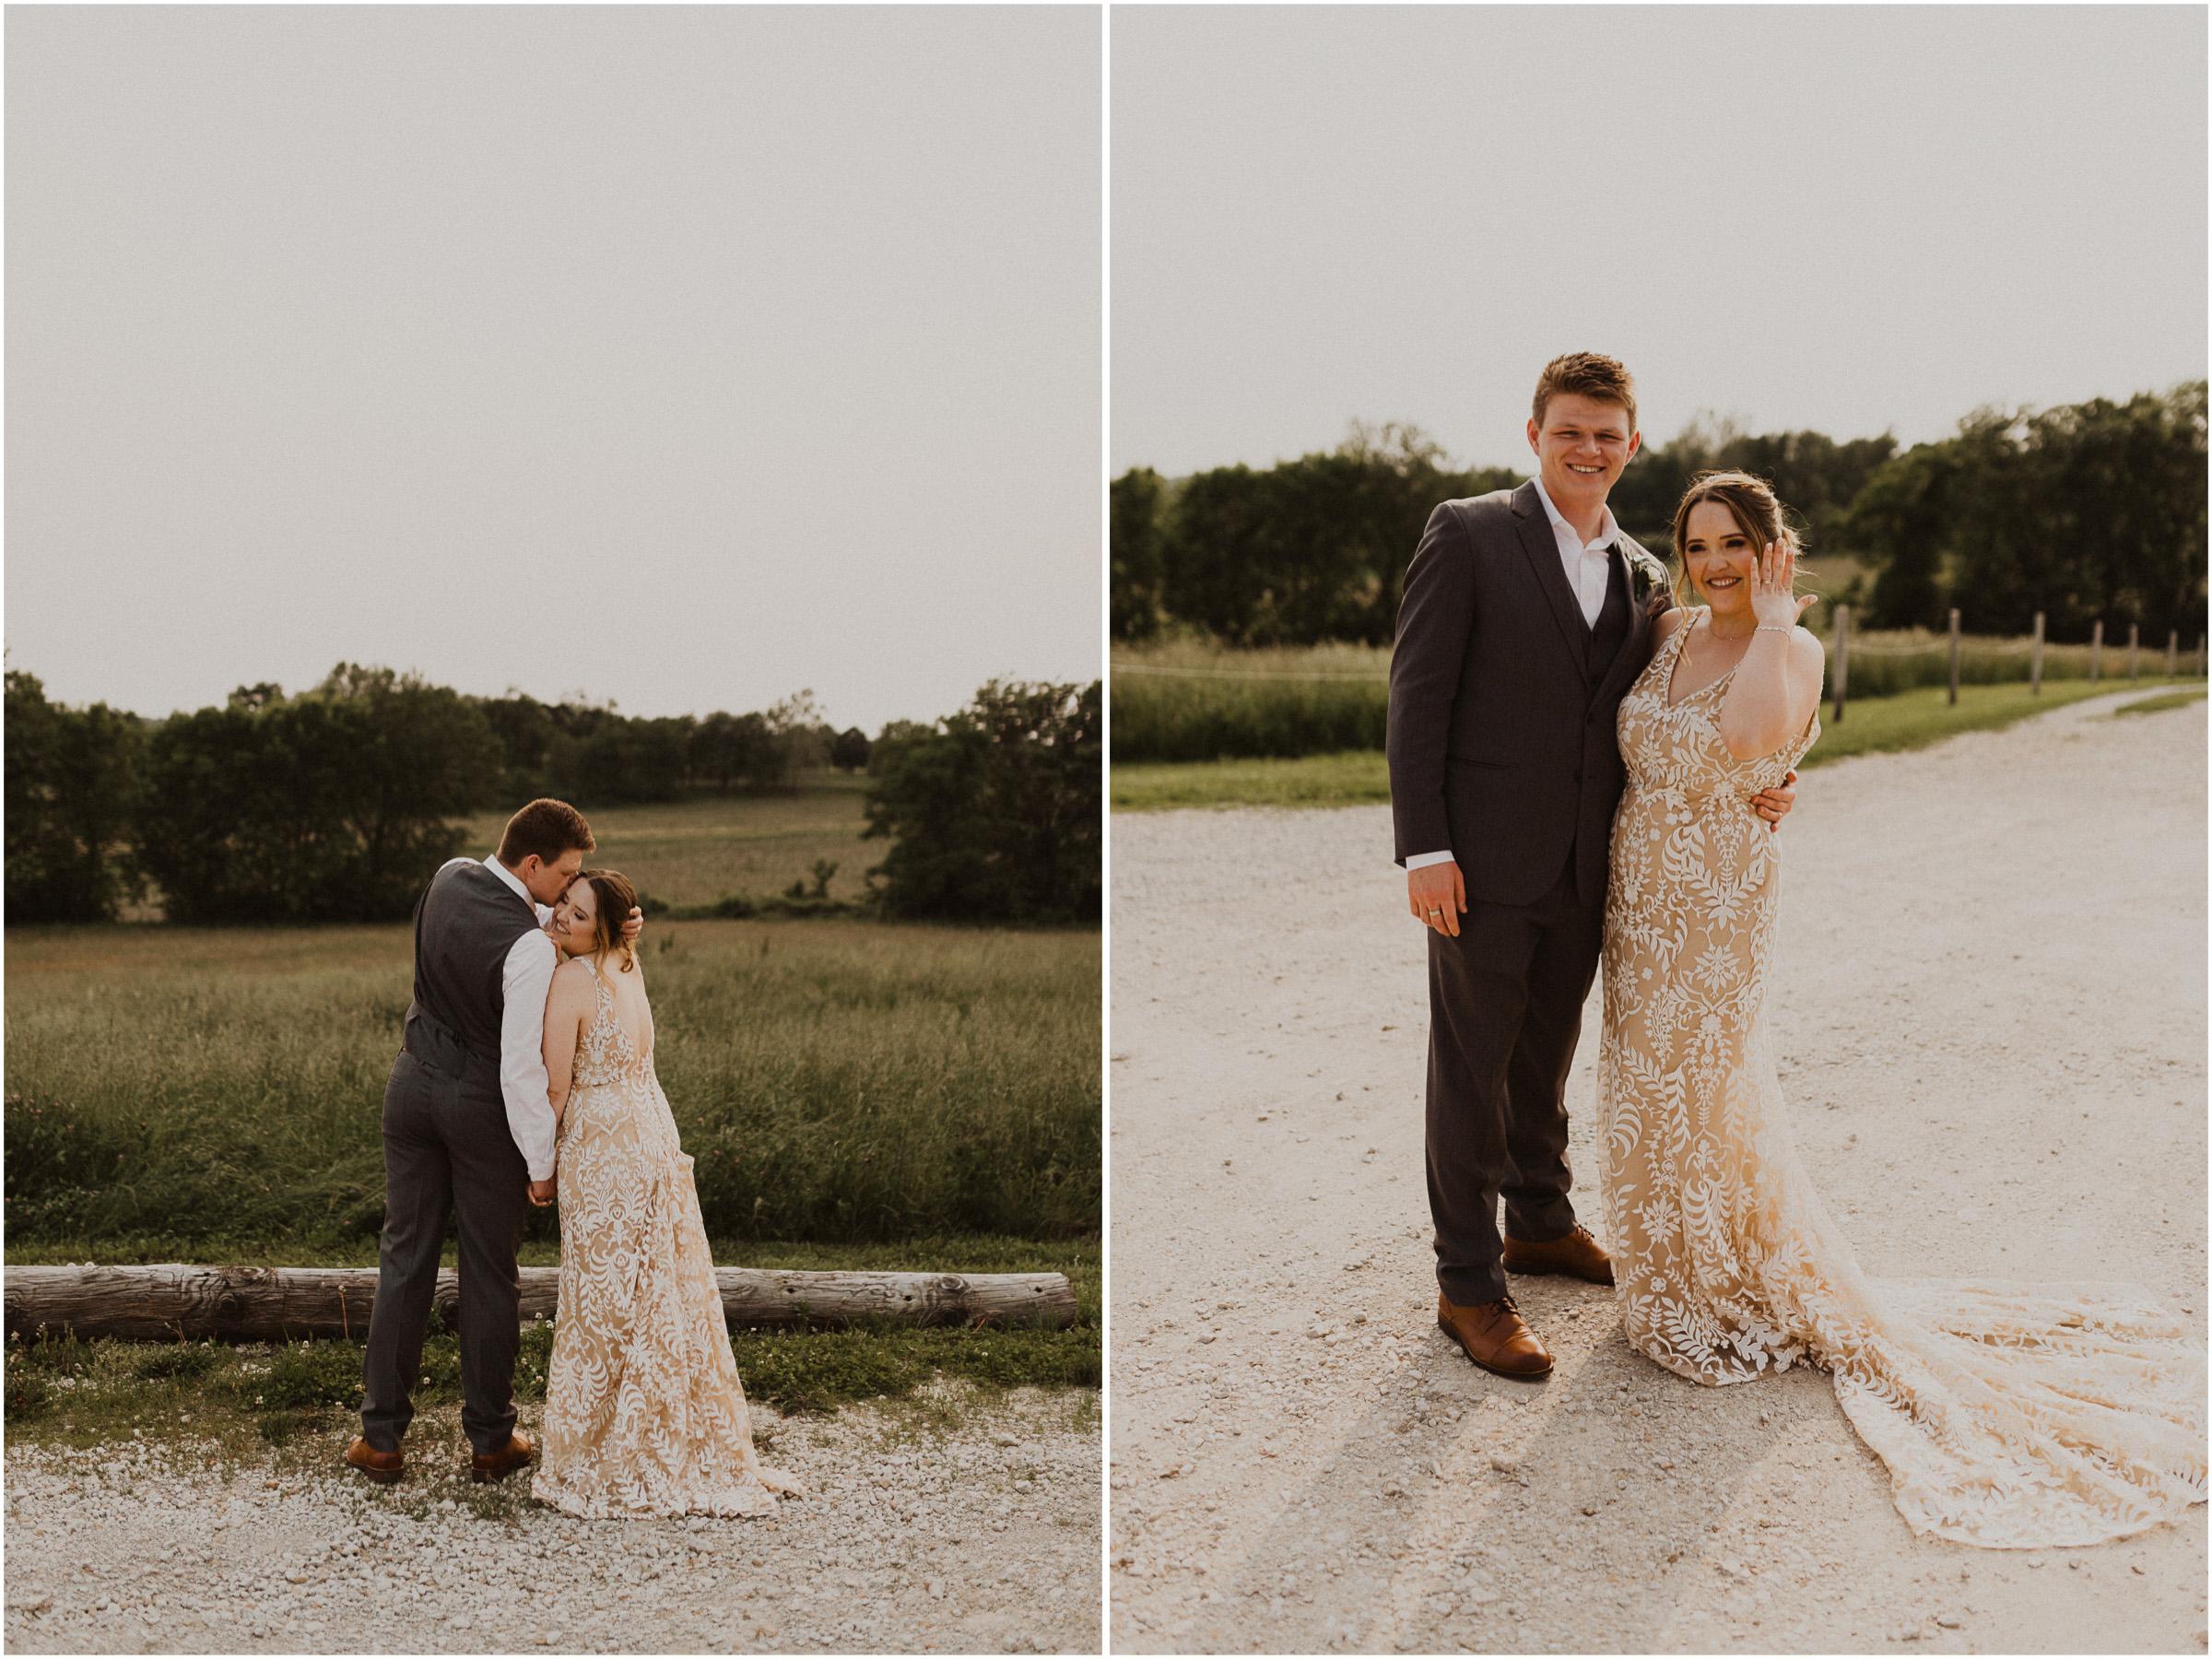 alyssa barletter photography weston red barn farm timberbarn summer outdoor wedding-51.jpg